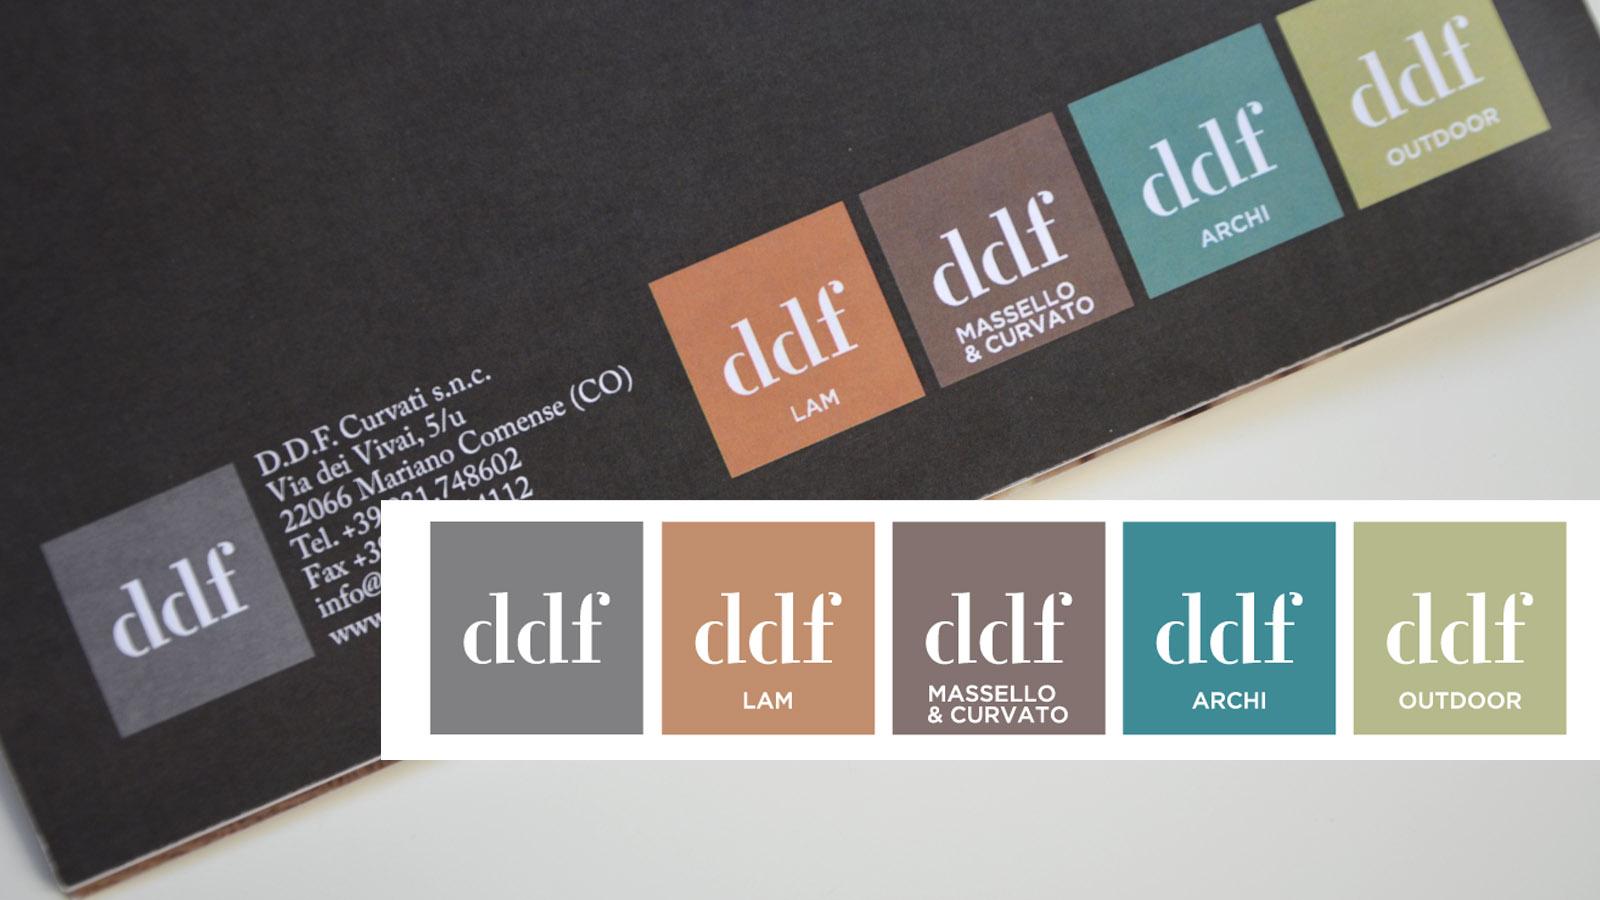 ddf-anteprima